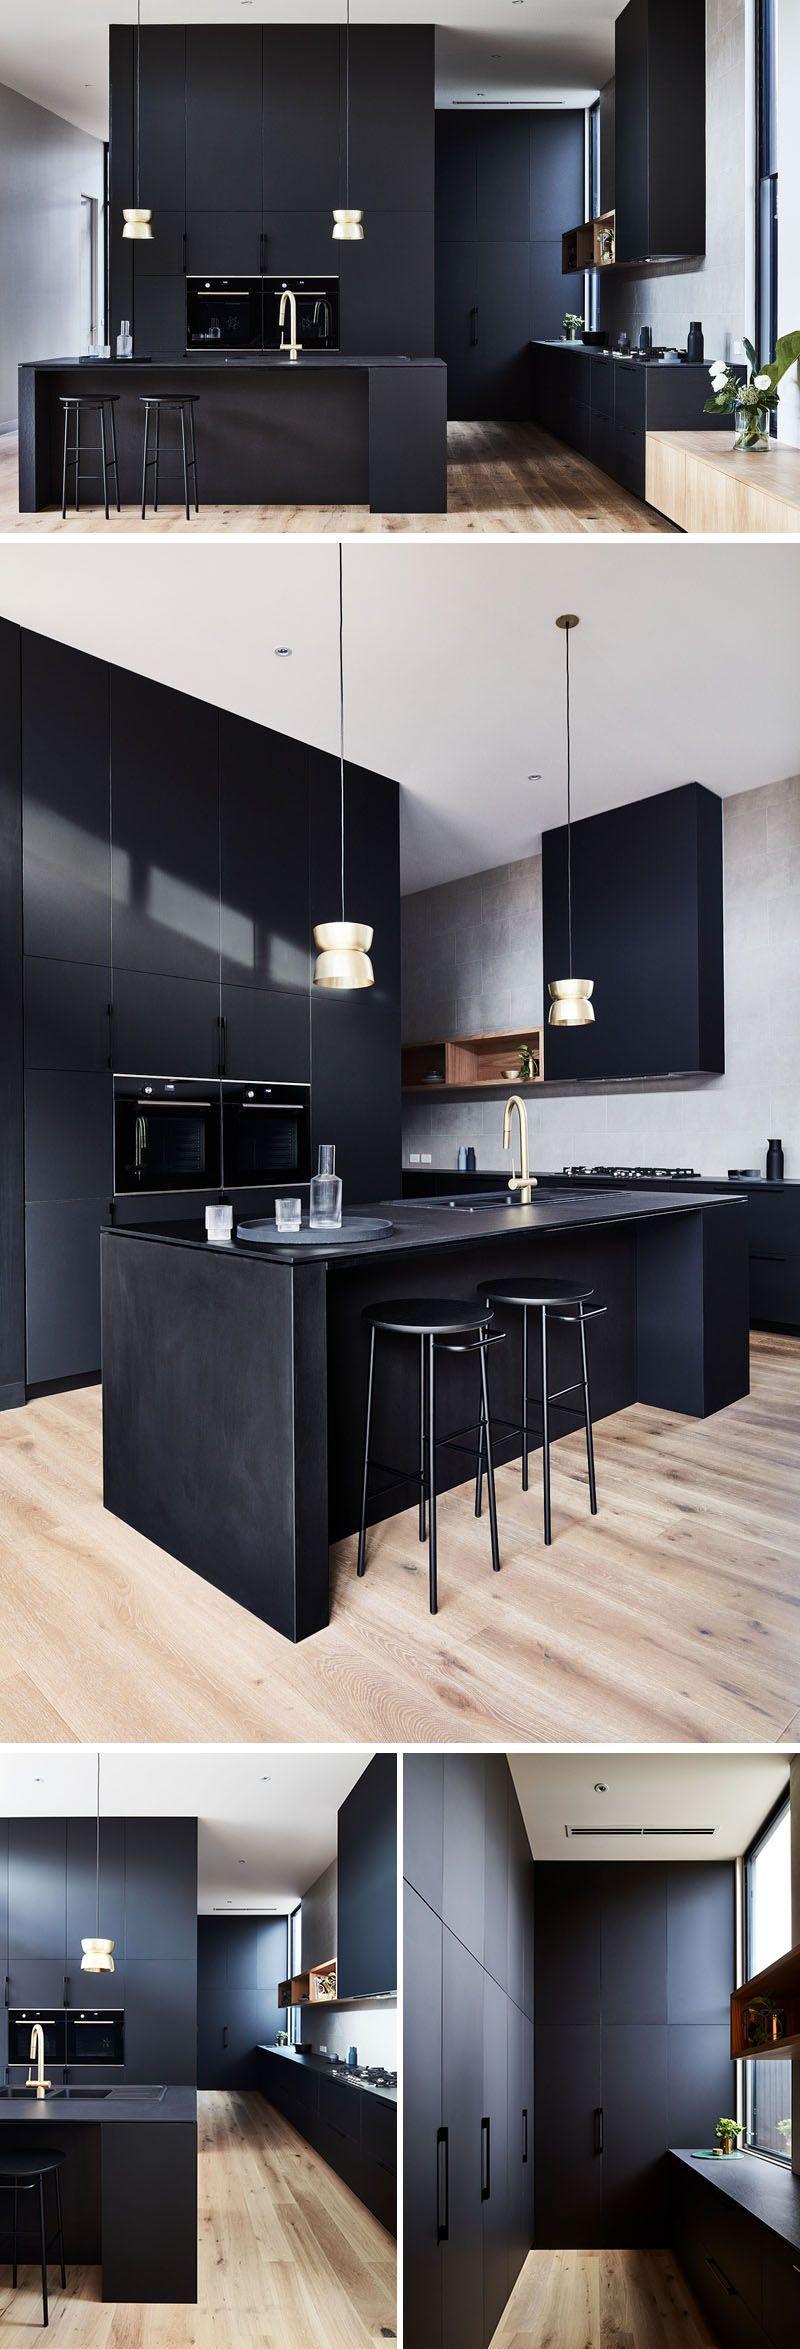 A matte black kitchen with minimal hardware makes a